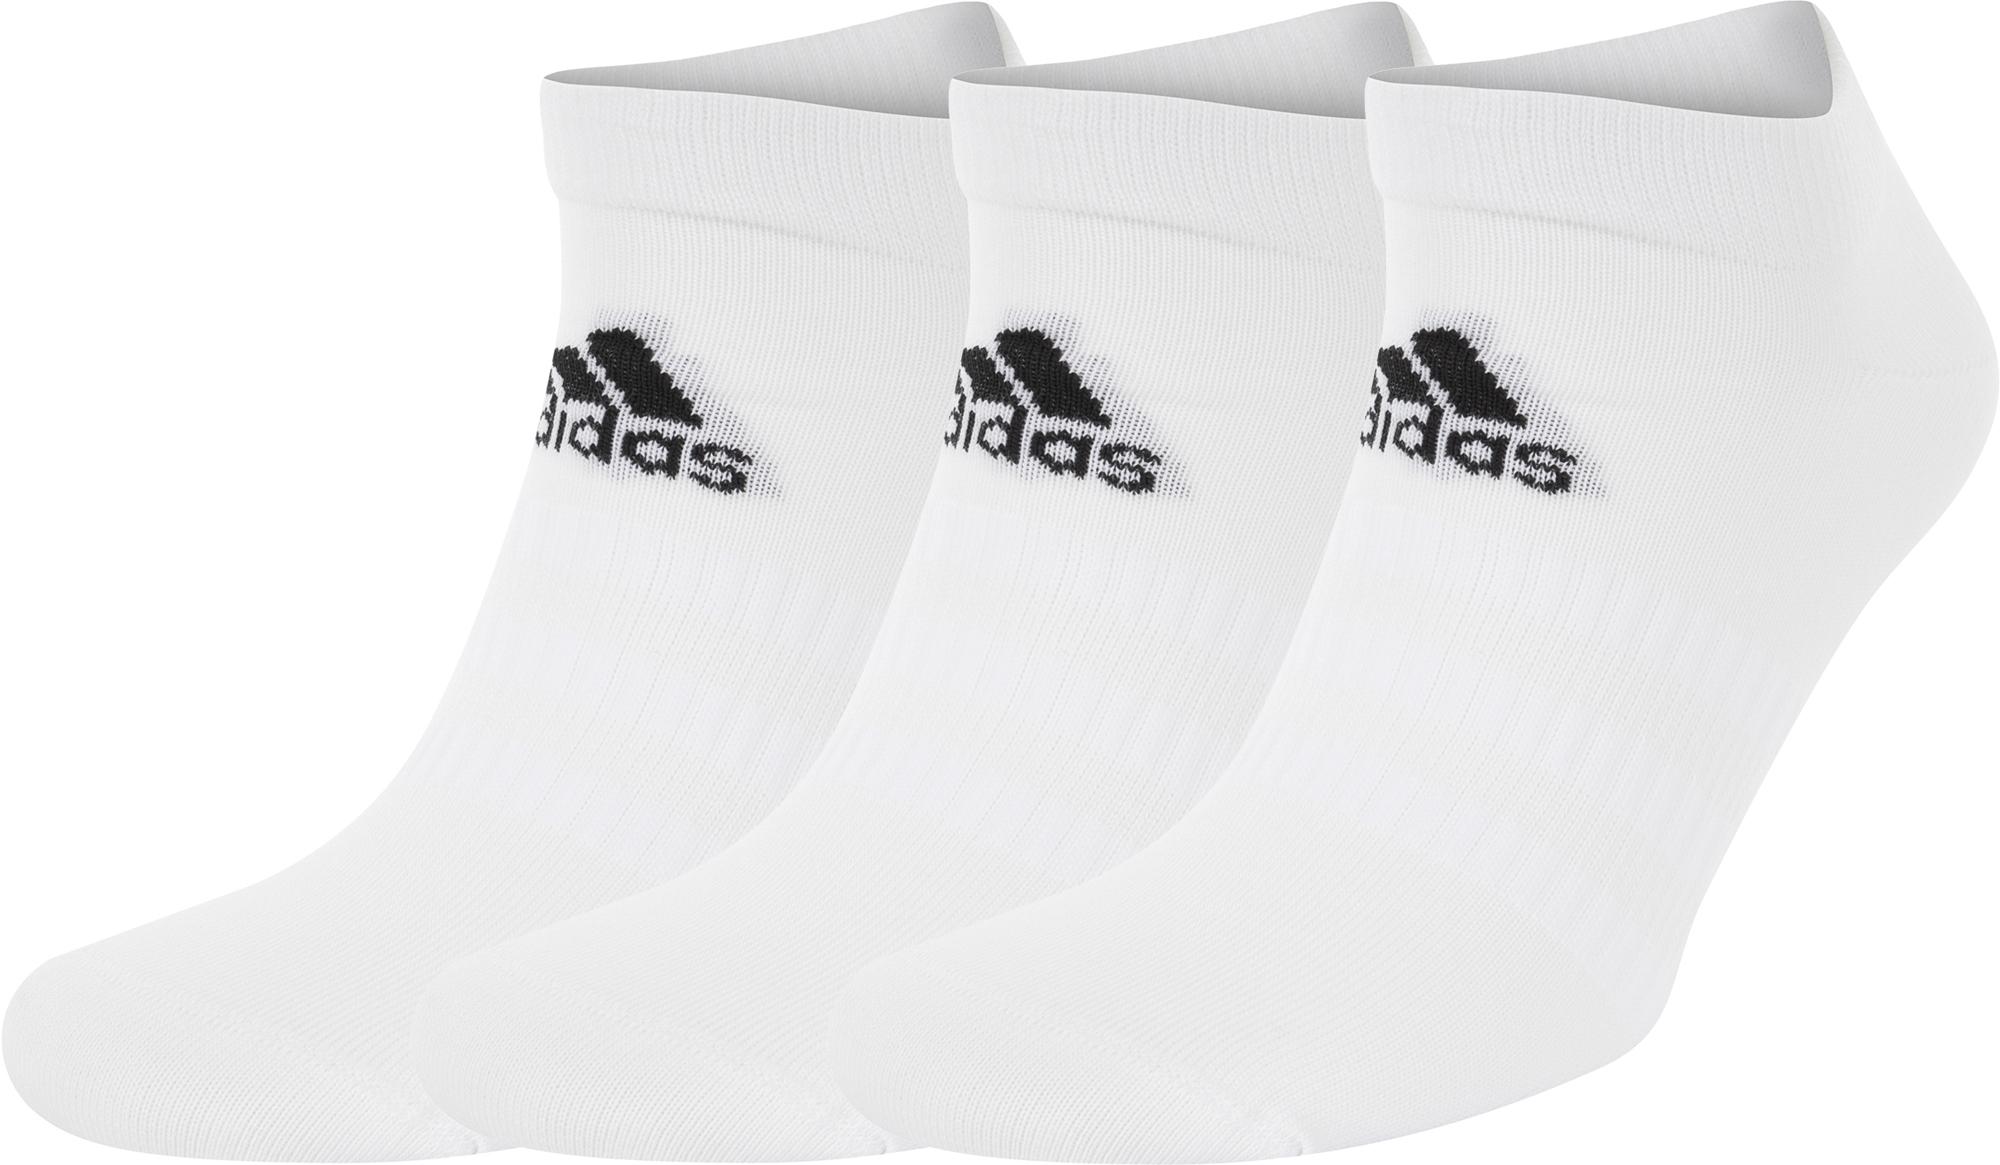 Adidas Носки Adidas Low-Cut, 3 пары, размер 46-48 цена 2017